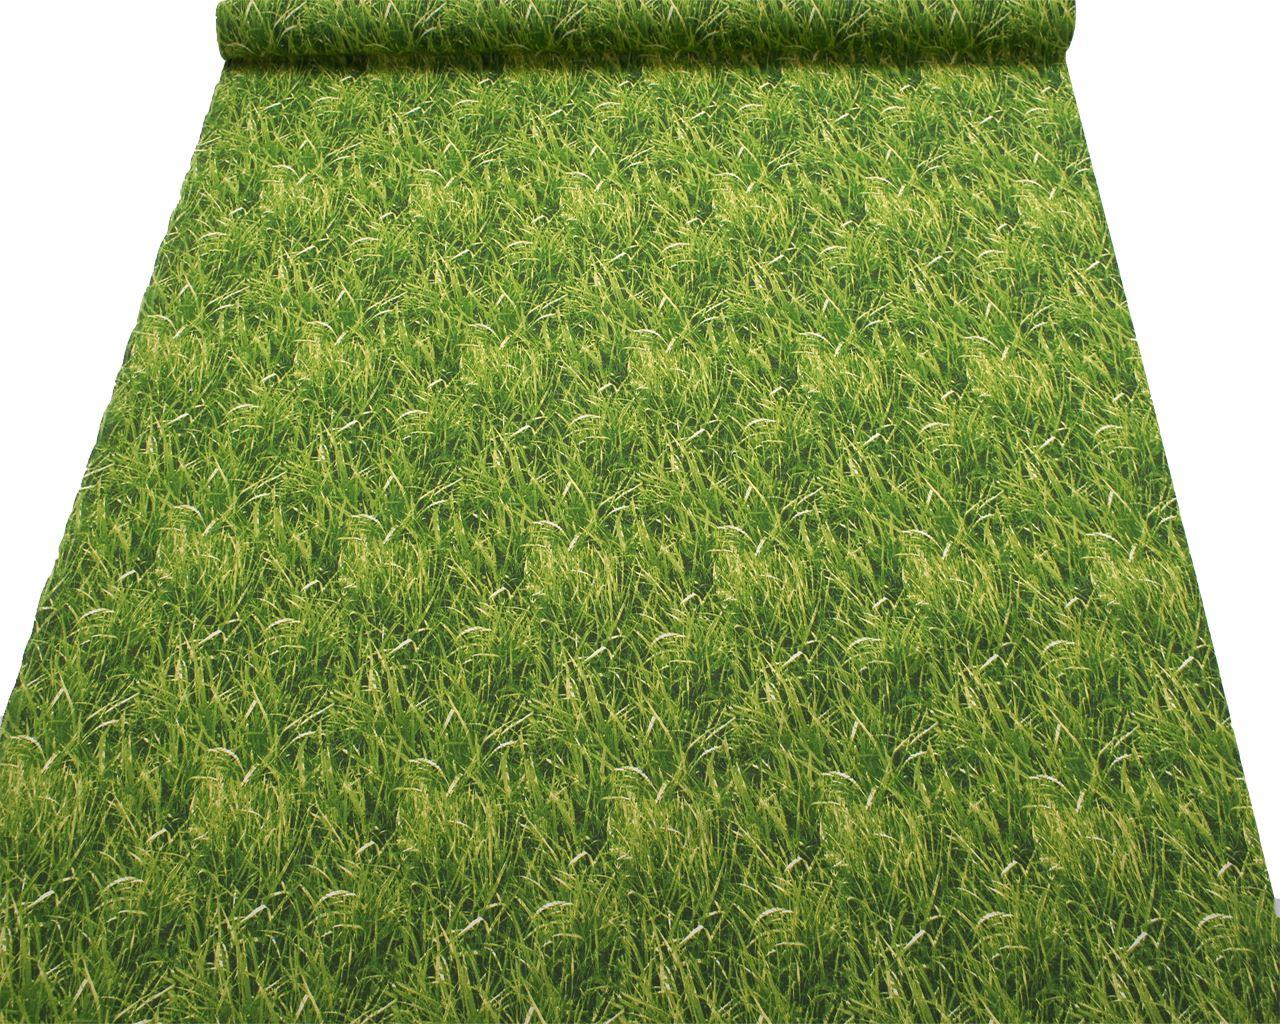 bedruckte baumwolle green grass garten basteln polster stoff ebay. Black Bedroom Furniture Sets. Home Design Ideas